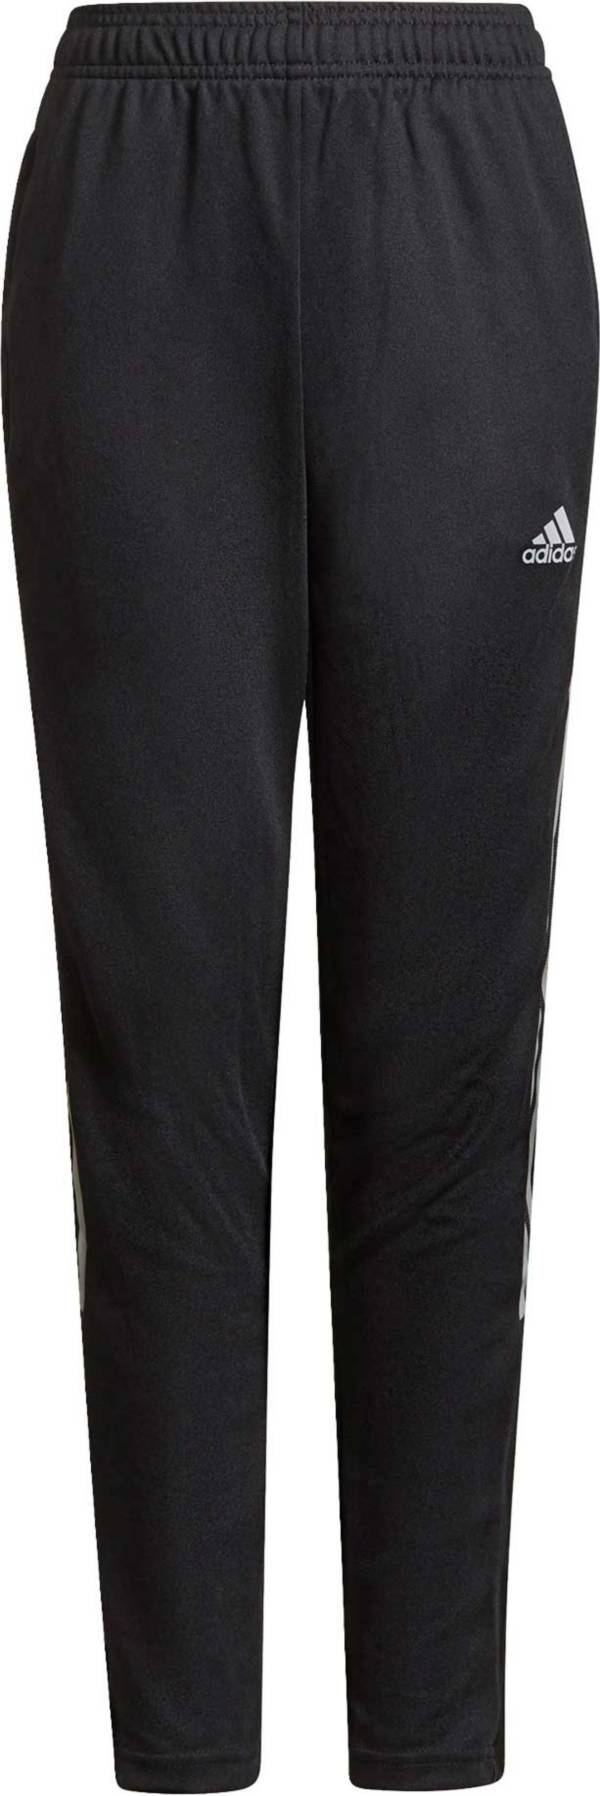 adidas Kids' Tiro Reflective Track Pants product image